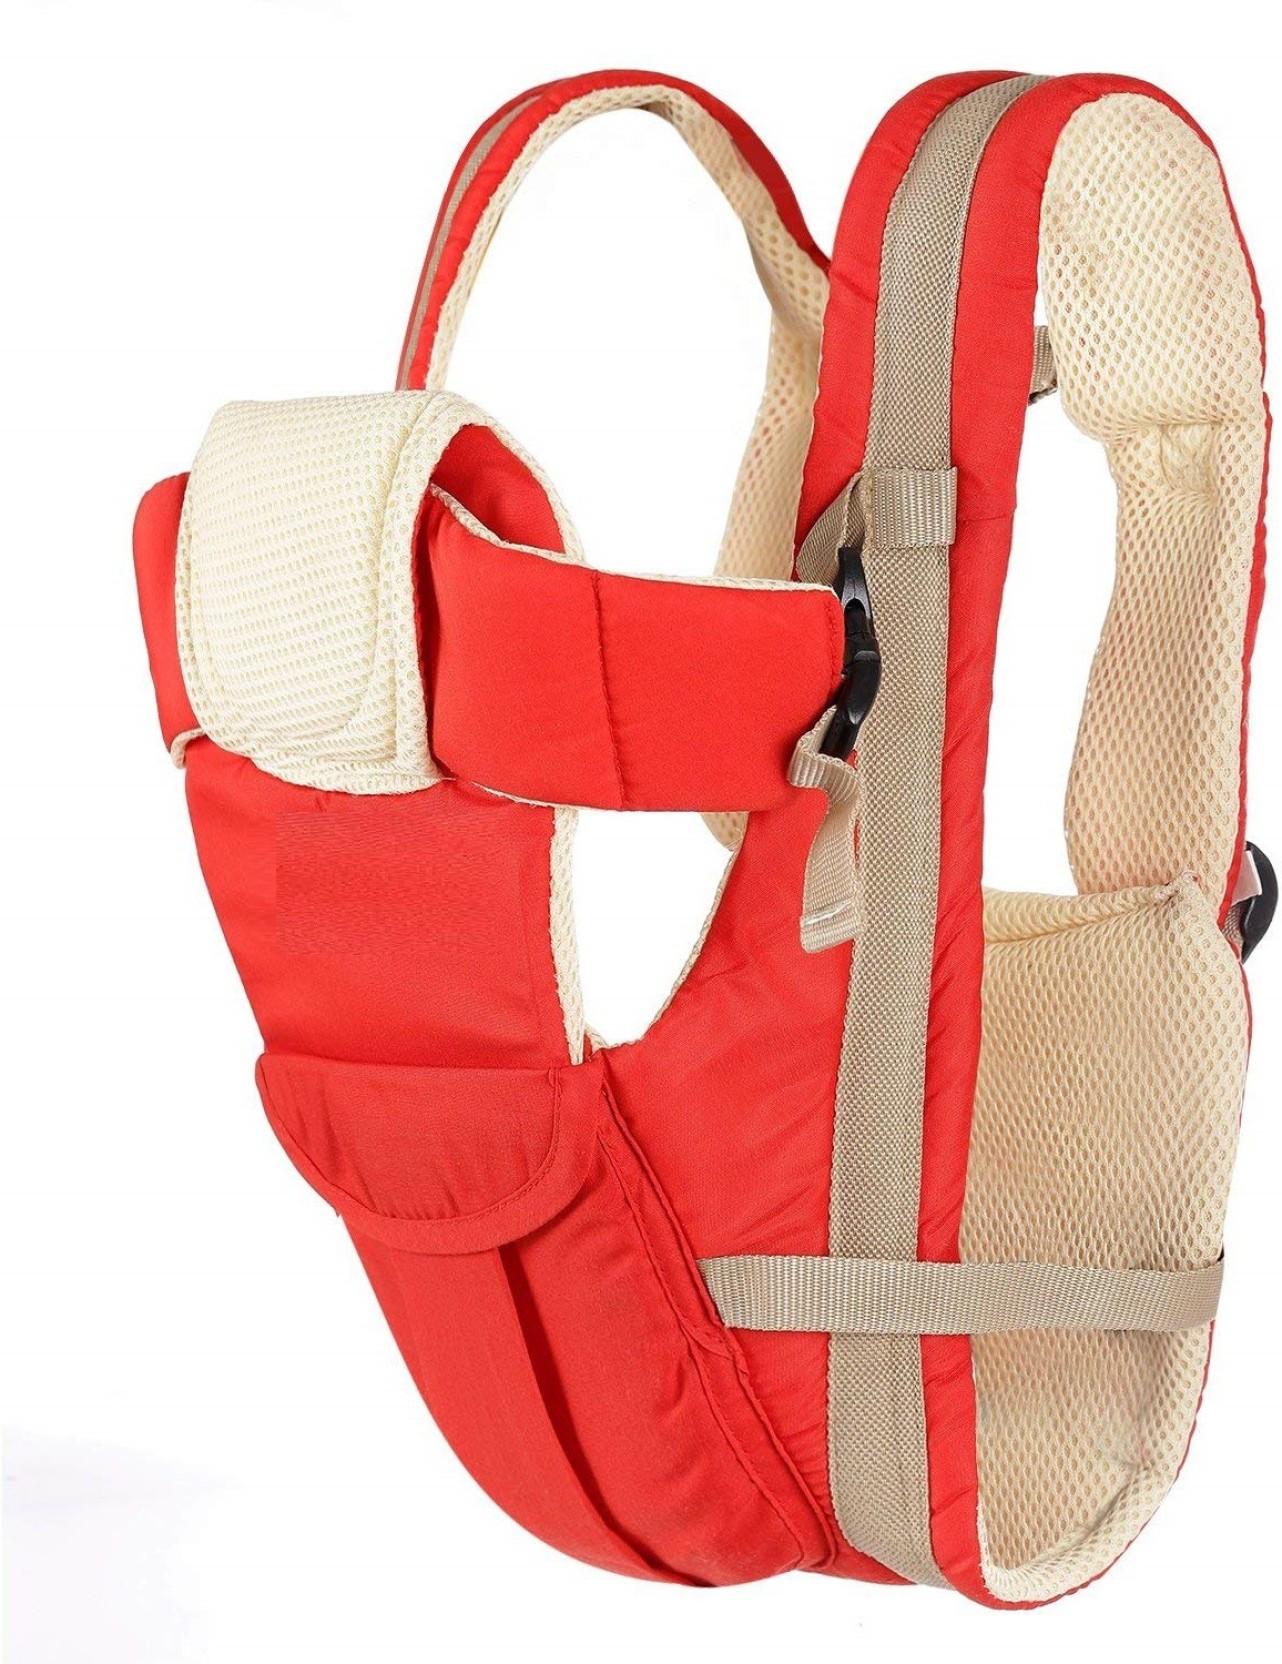 Aayat Kids Adjustable 4 Positions Baby Carrier 3D Backpack